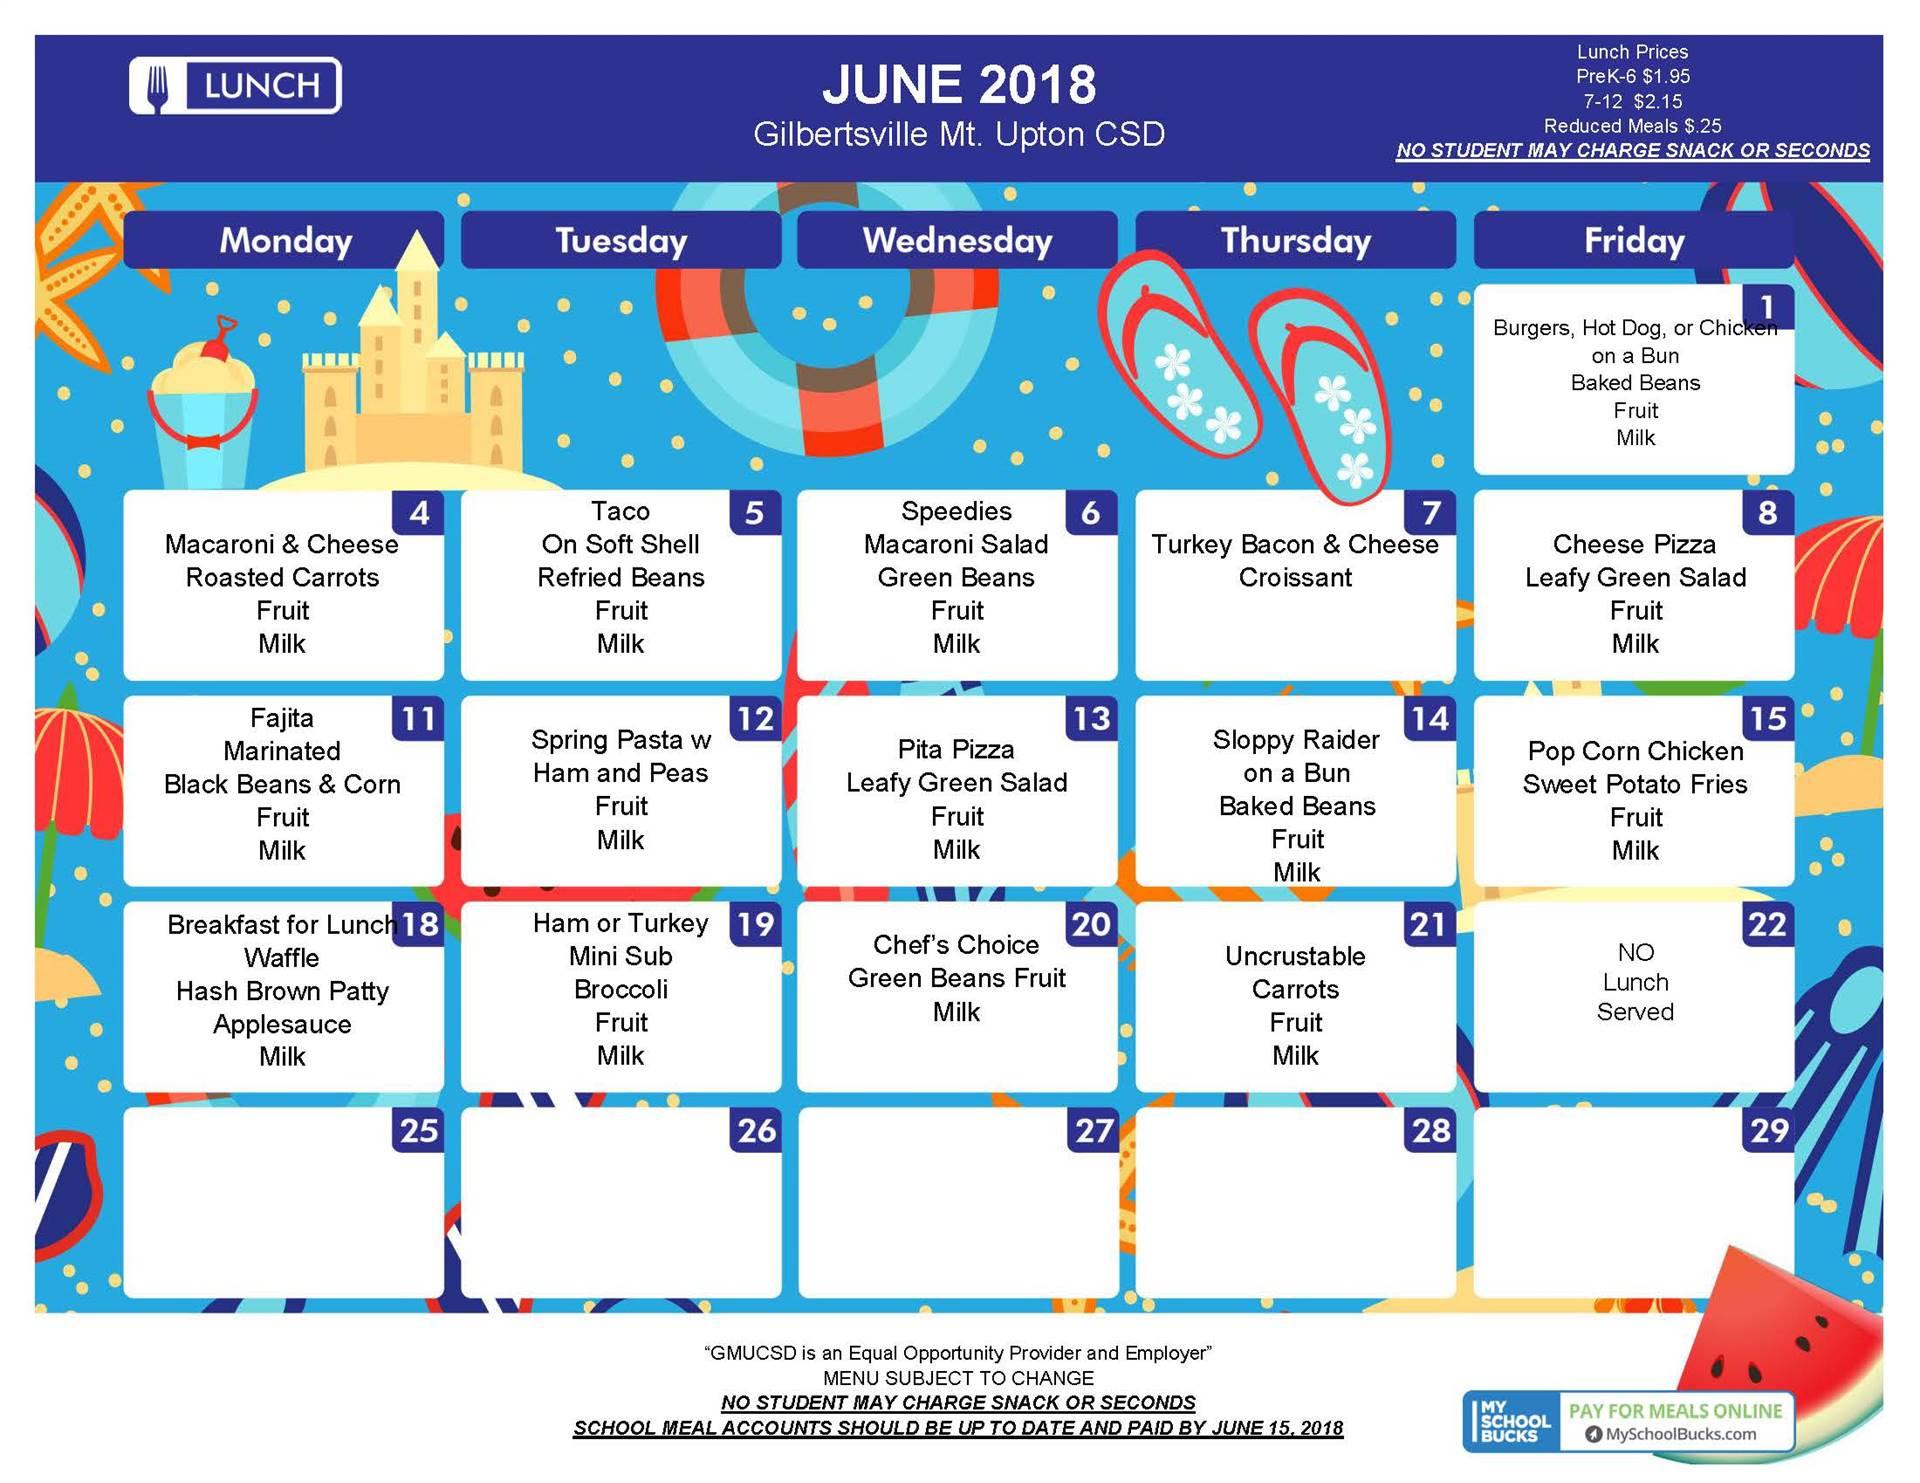 June 2018 Lunch Menu